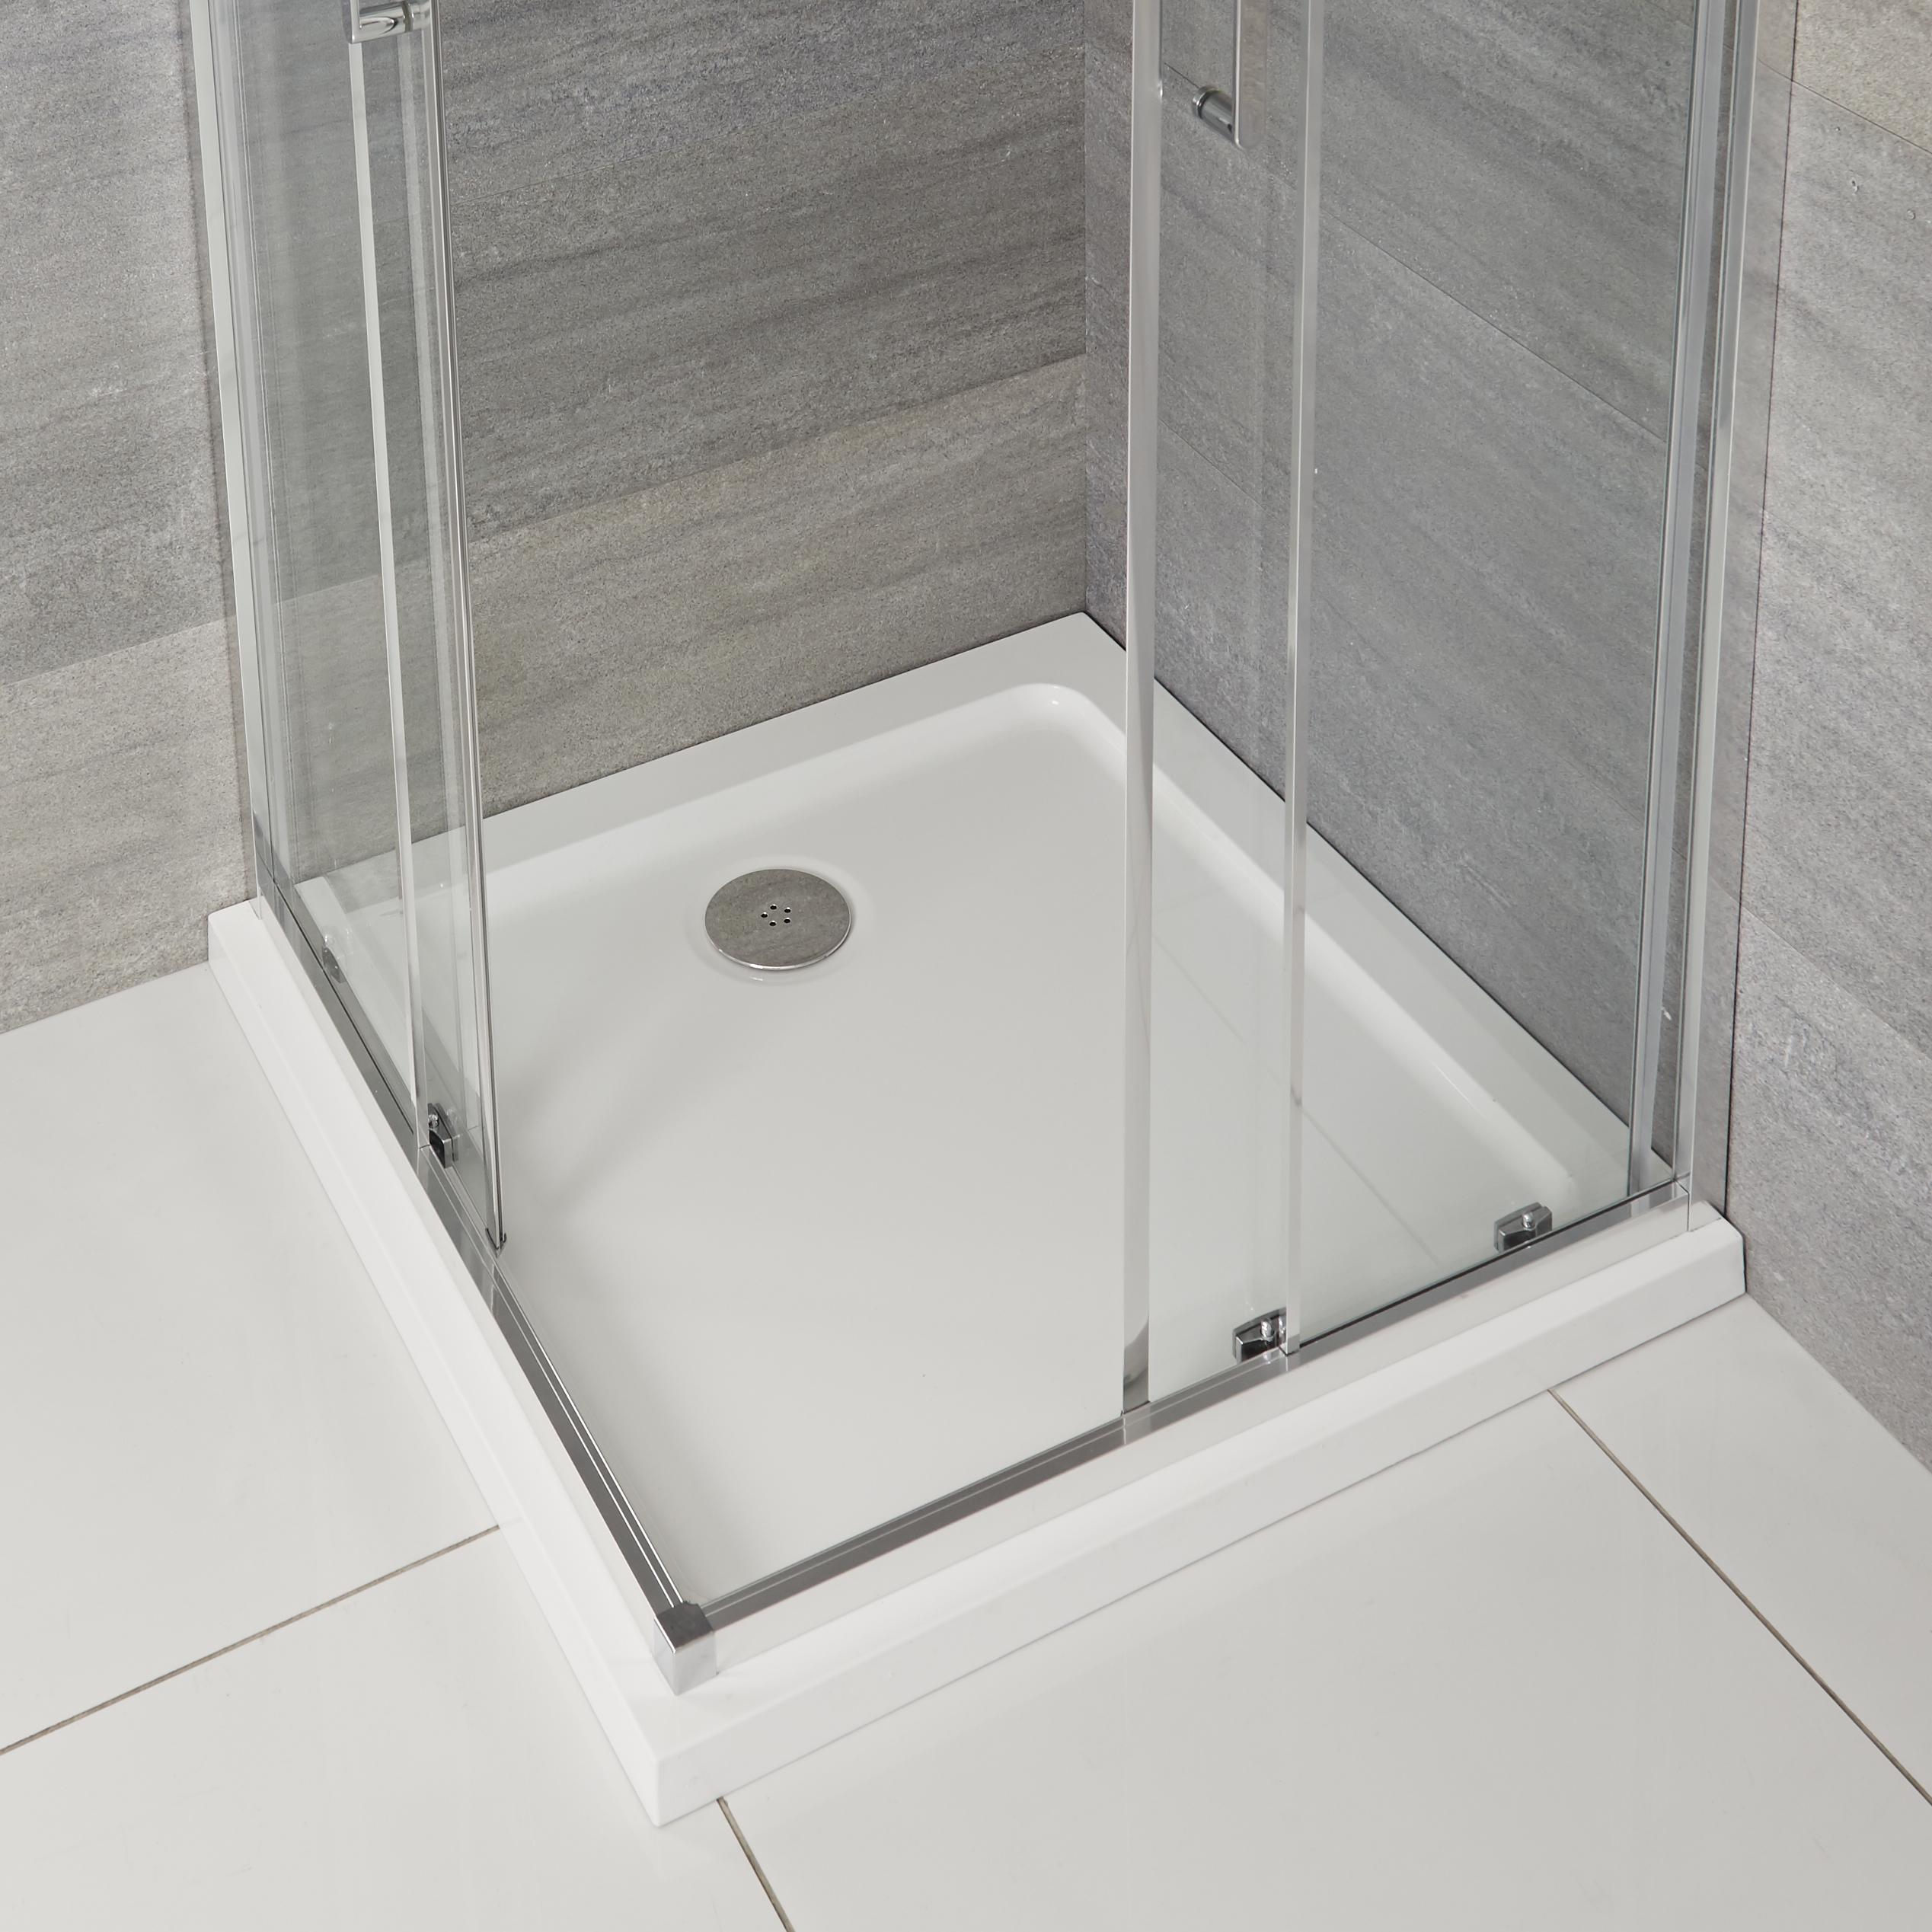 Vierkante Douchebak Wit Afgedekt met Acryl 70 x 70cm | Maxon